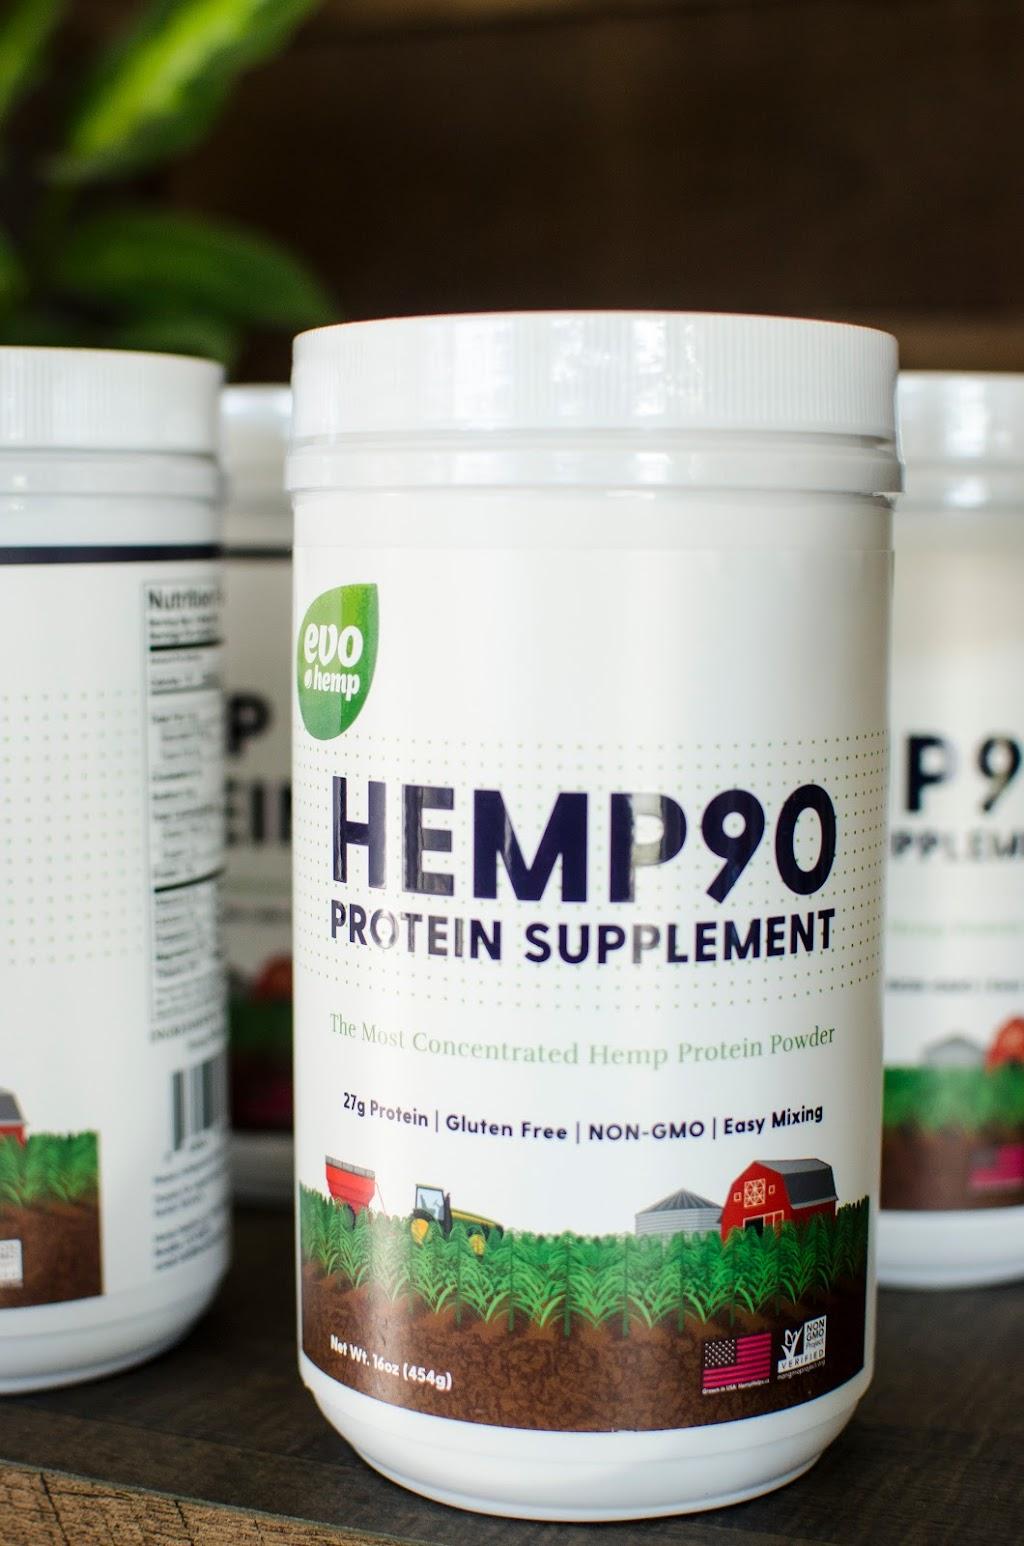 Hemp Spot - health  | Photo 7 of 10 | Address: 28801 Lakeshore Blvd, Willowick, OH 44095, USA | Phone: (440) 833-4099